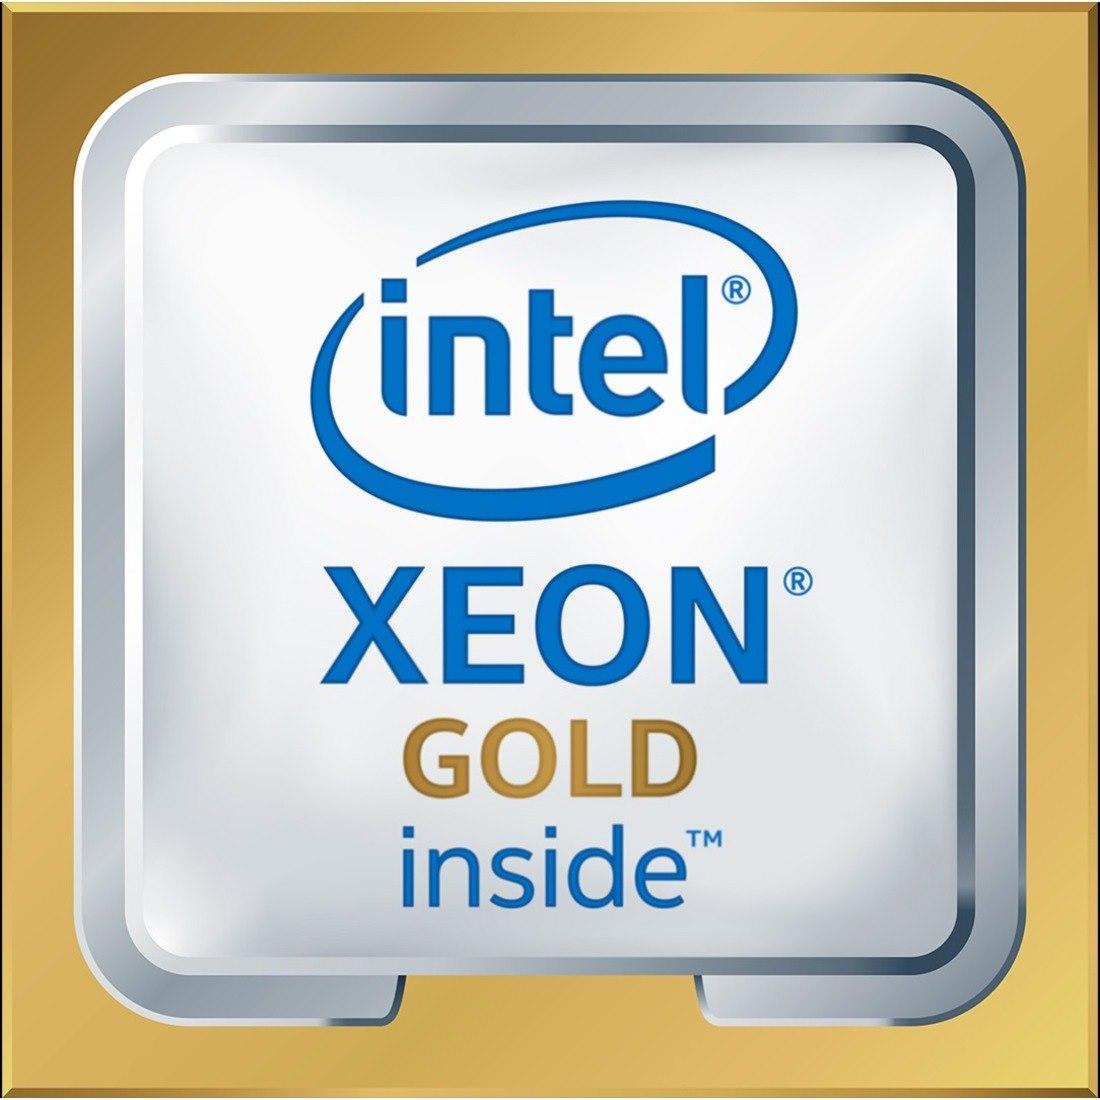 HPE Intel Xeon Gold 5218N Hexadeca-core (16 Core) 2.30 GHz Processor Upgrade